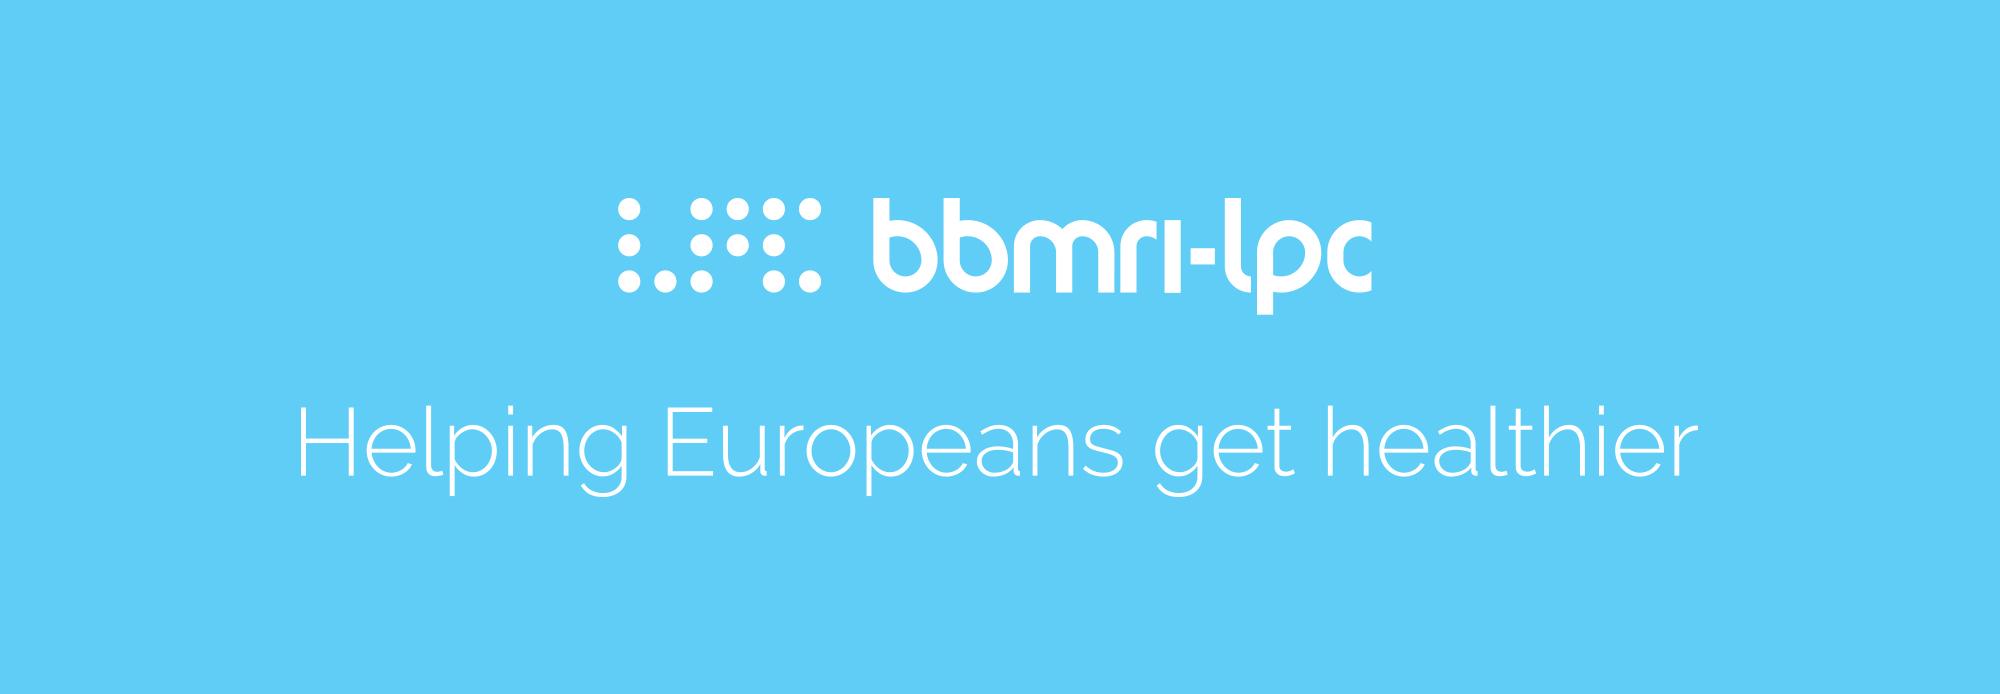 bbmri_slogan